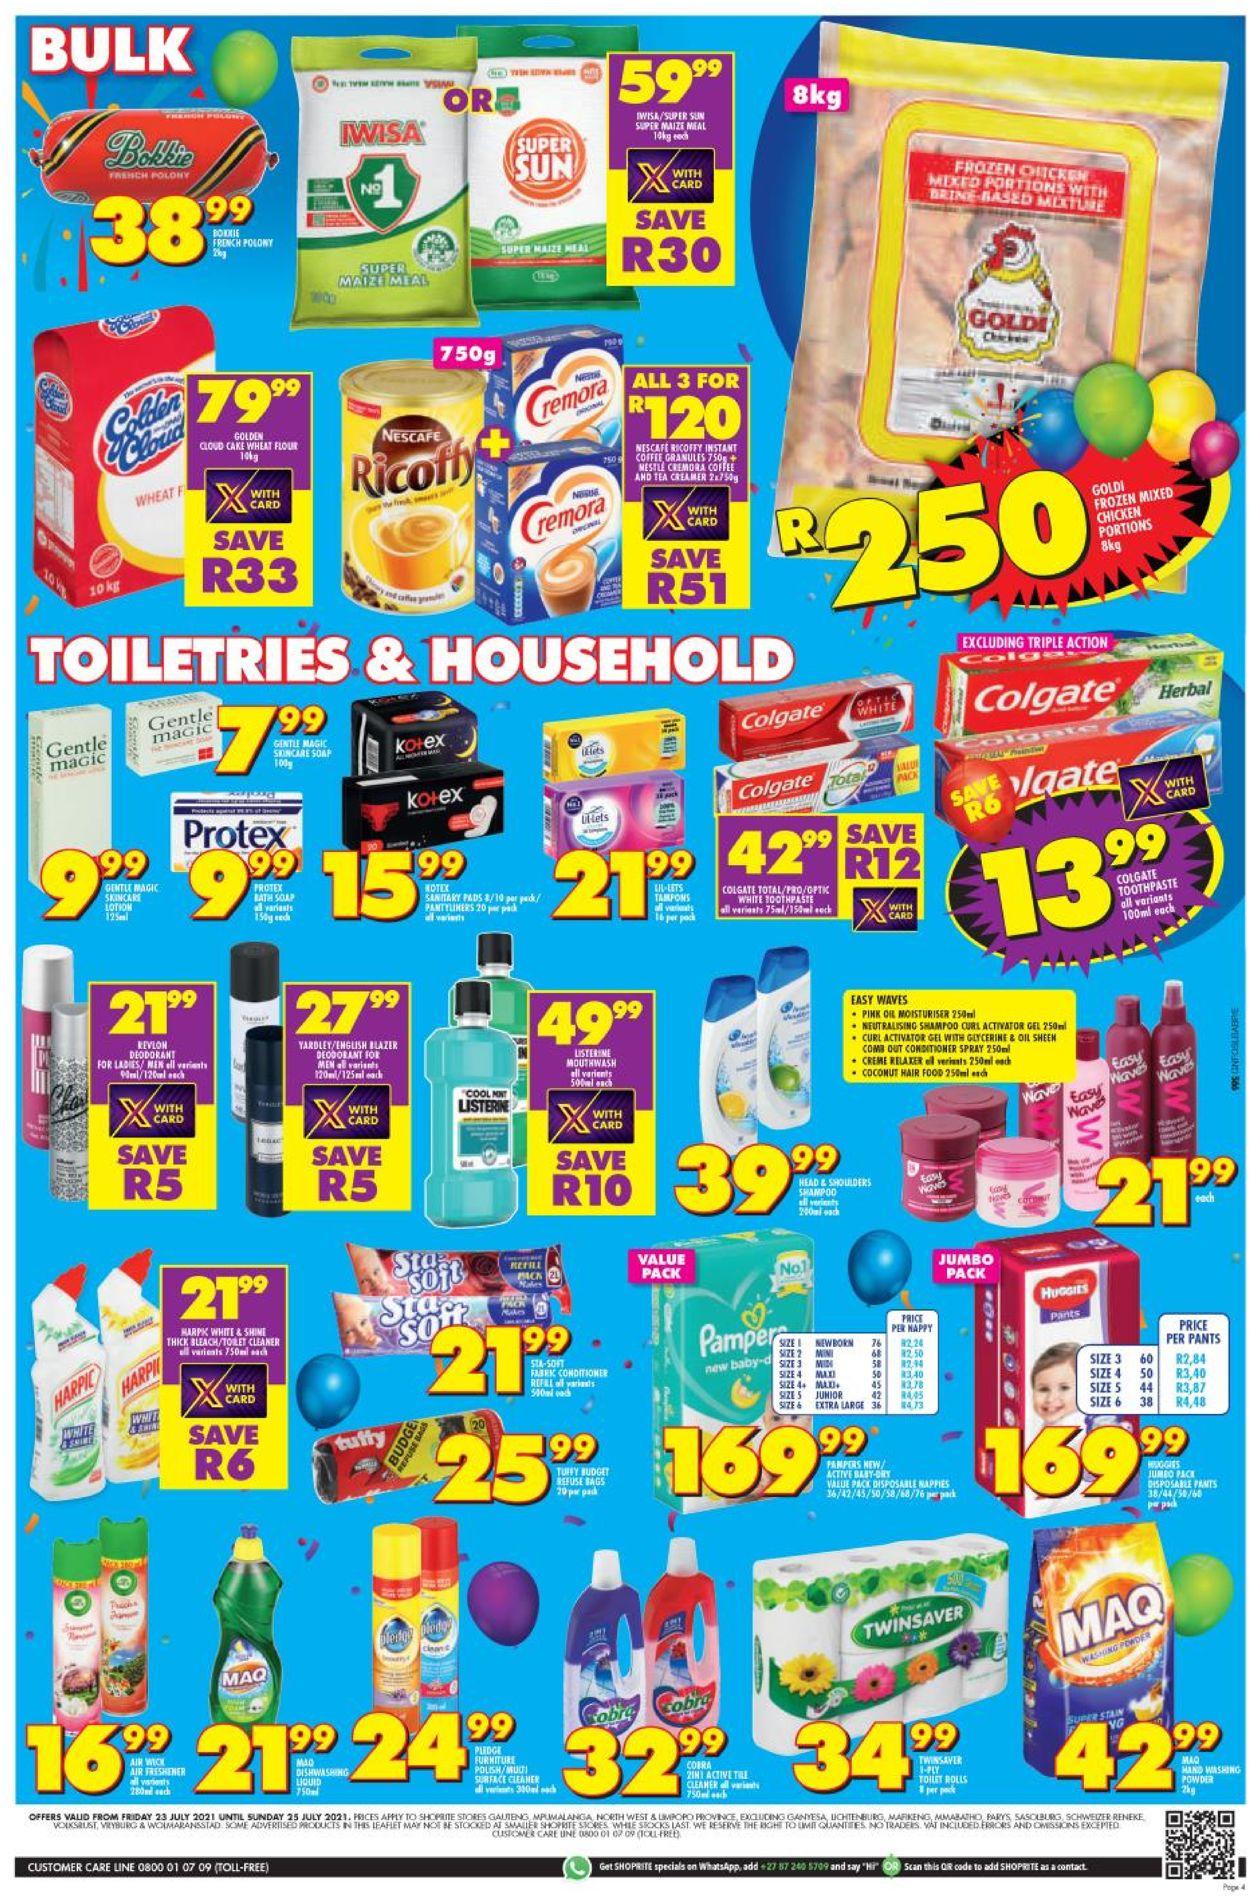 Shoprite Catalogue - 2021/07/23-2021/07/25 (Page 3)